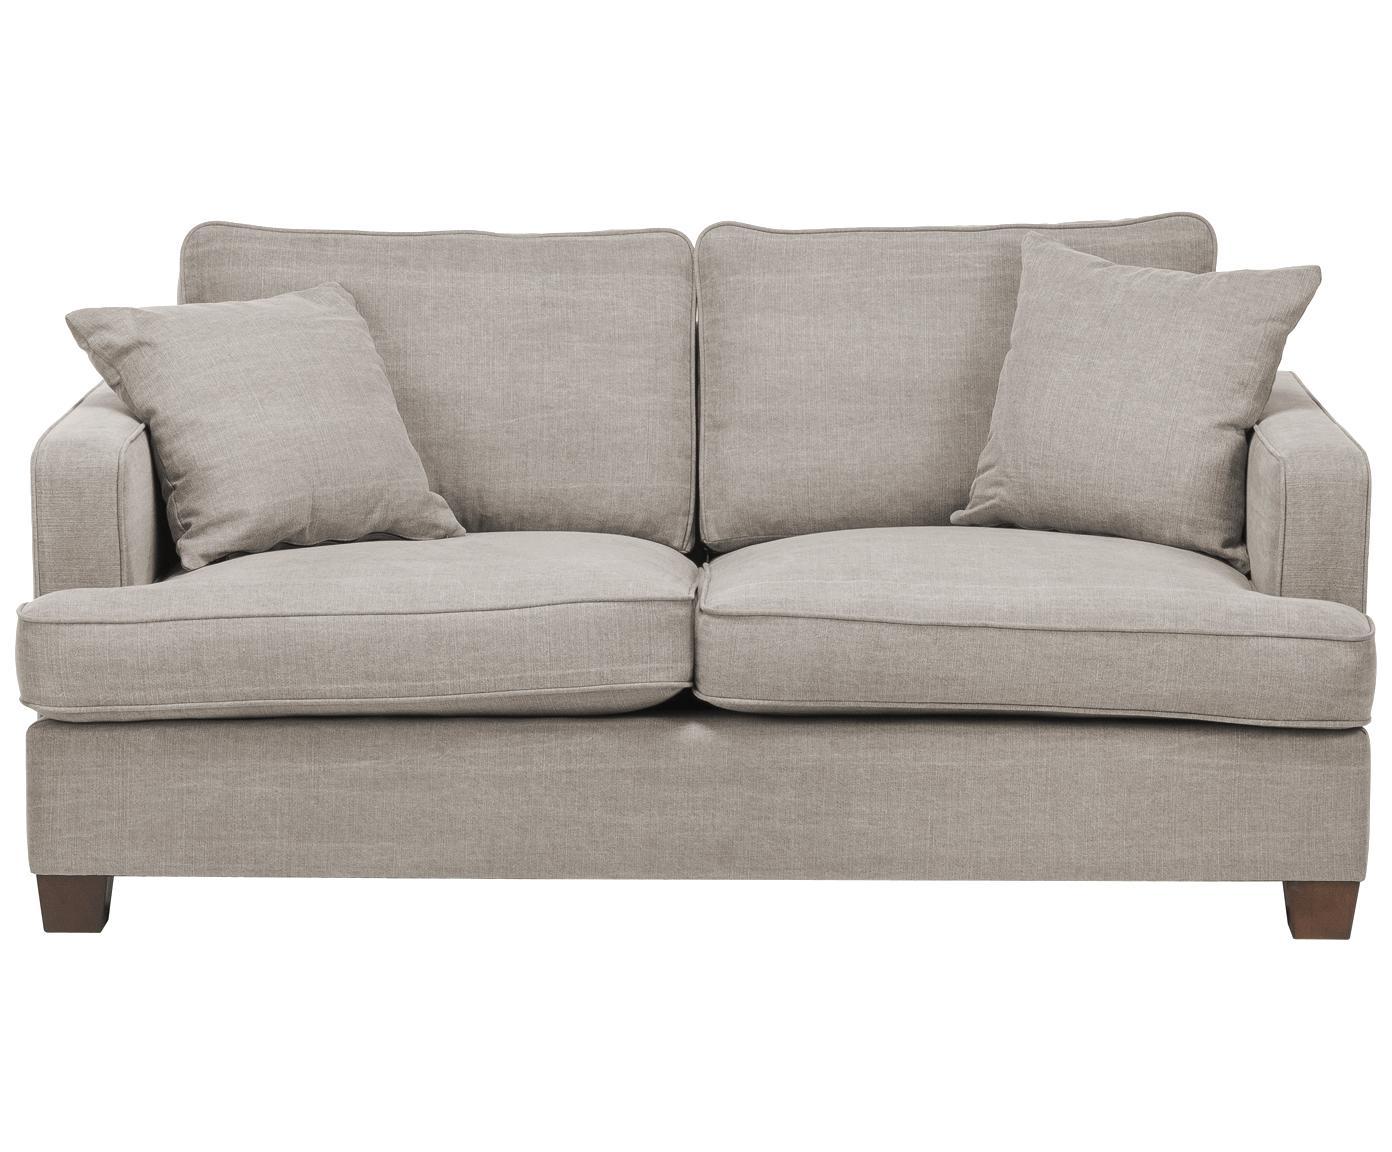 Sofá grande Warren (2plazas), Estructura: madera, Tapizado: 60%algodón, 40%lino La , Patas: madera negra, Arena gris, An 178 x Al 85 cm